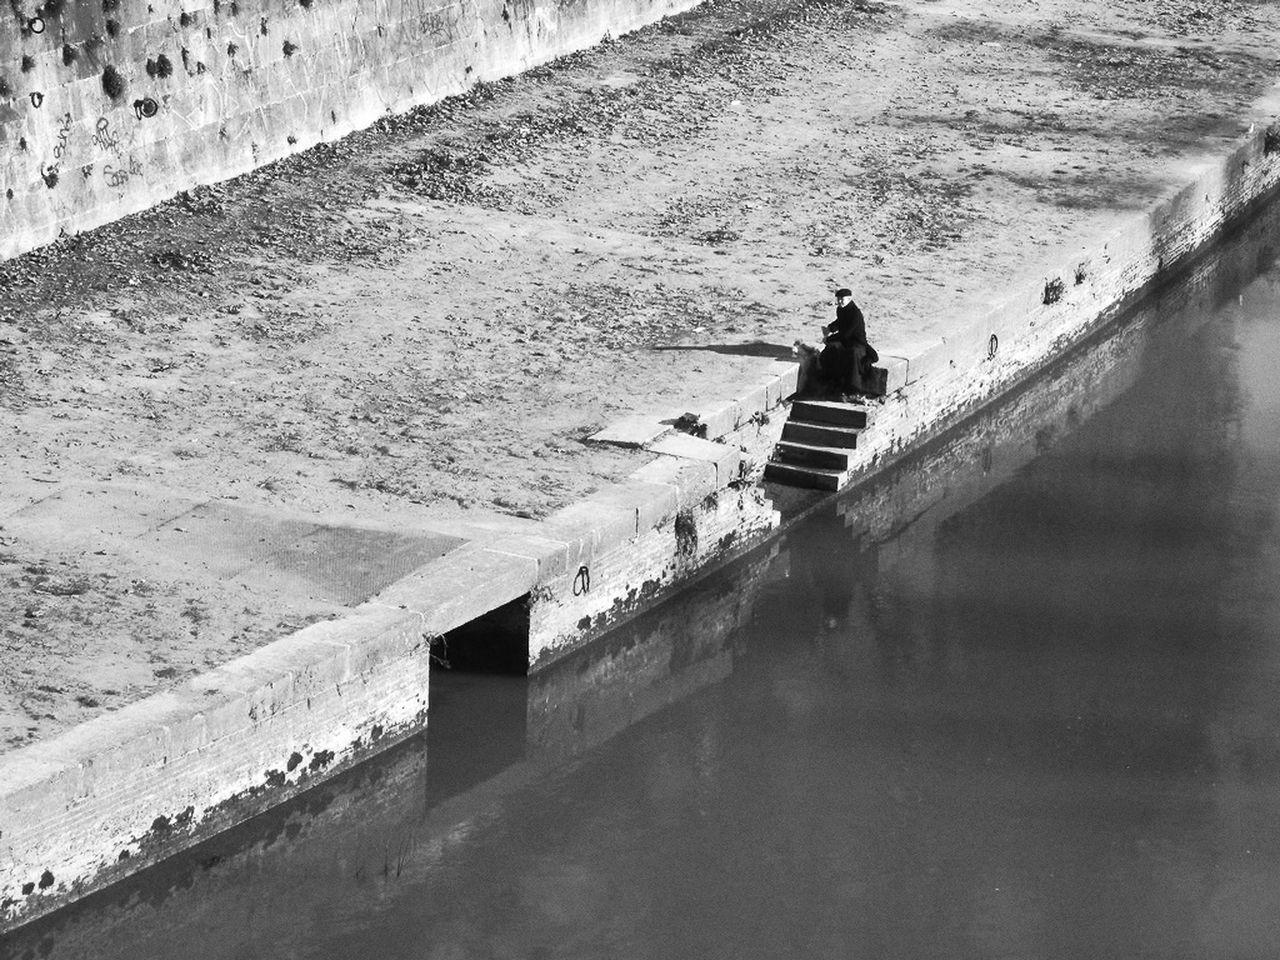 Sunny Day Urban Exploration Other View Streetphotography Black & White Blackandwhite Walking AroundWalking Around The City  Riverwalk TheMinimals (less Edit Juxt Photography)